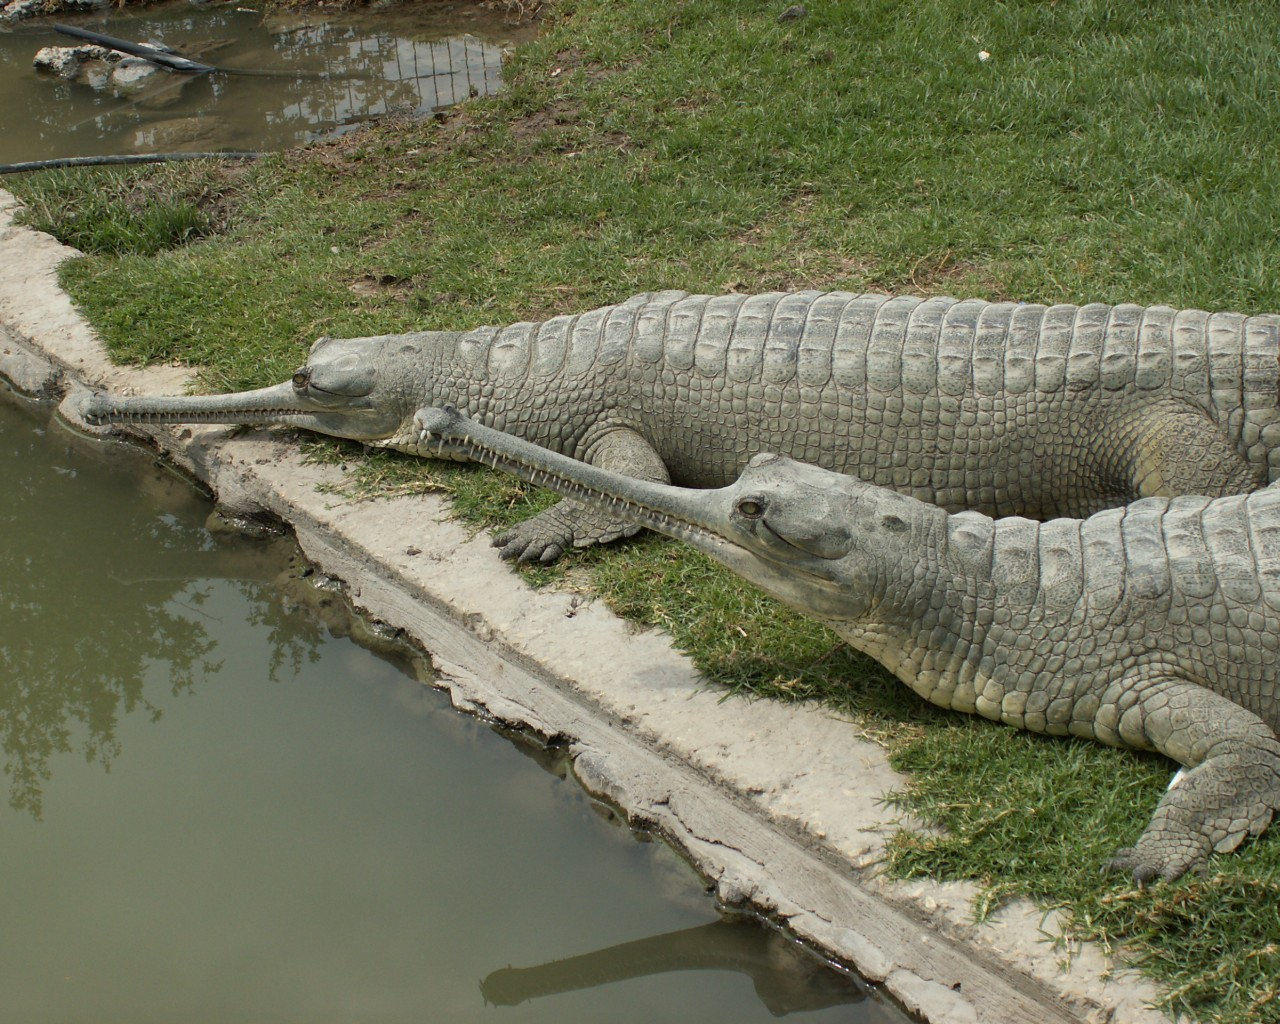 The animal kingdom reptile family wallpaper